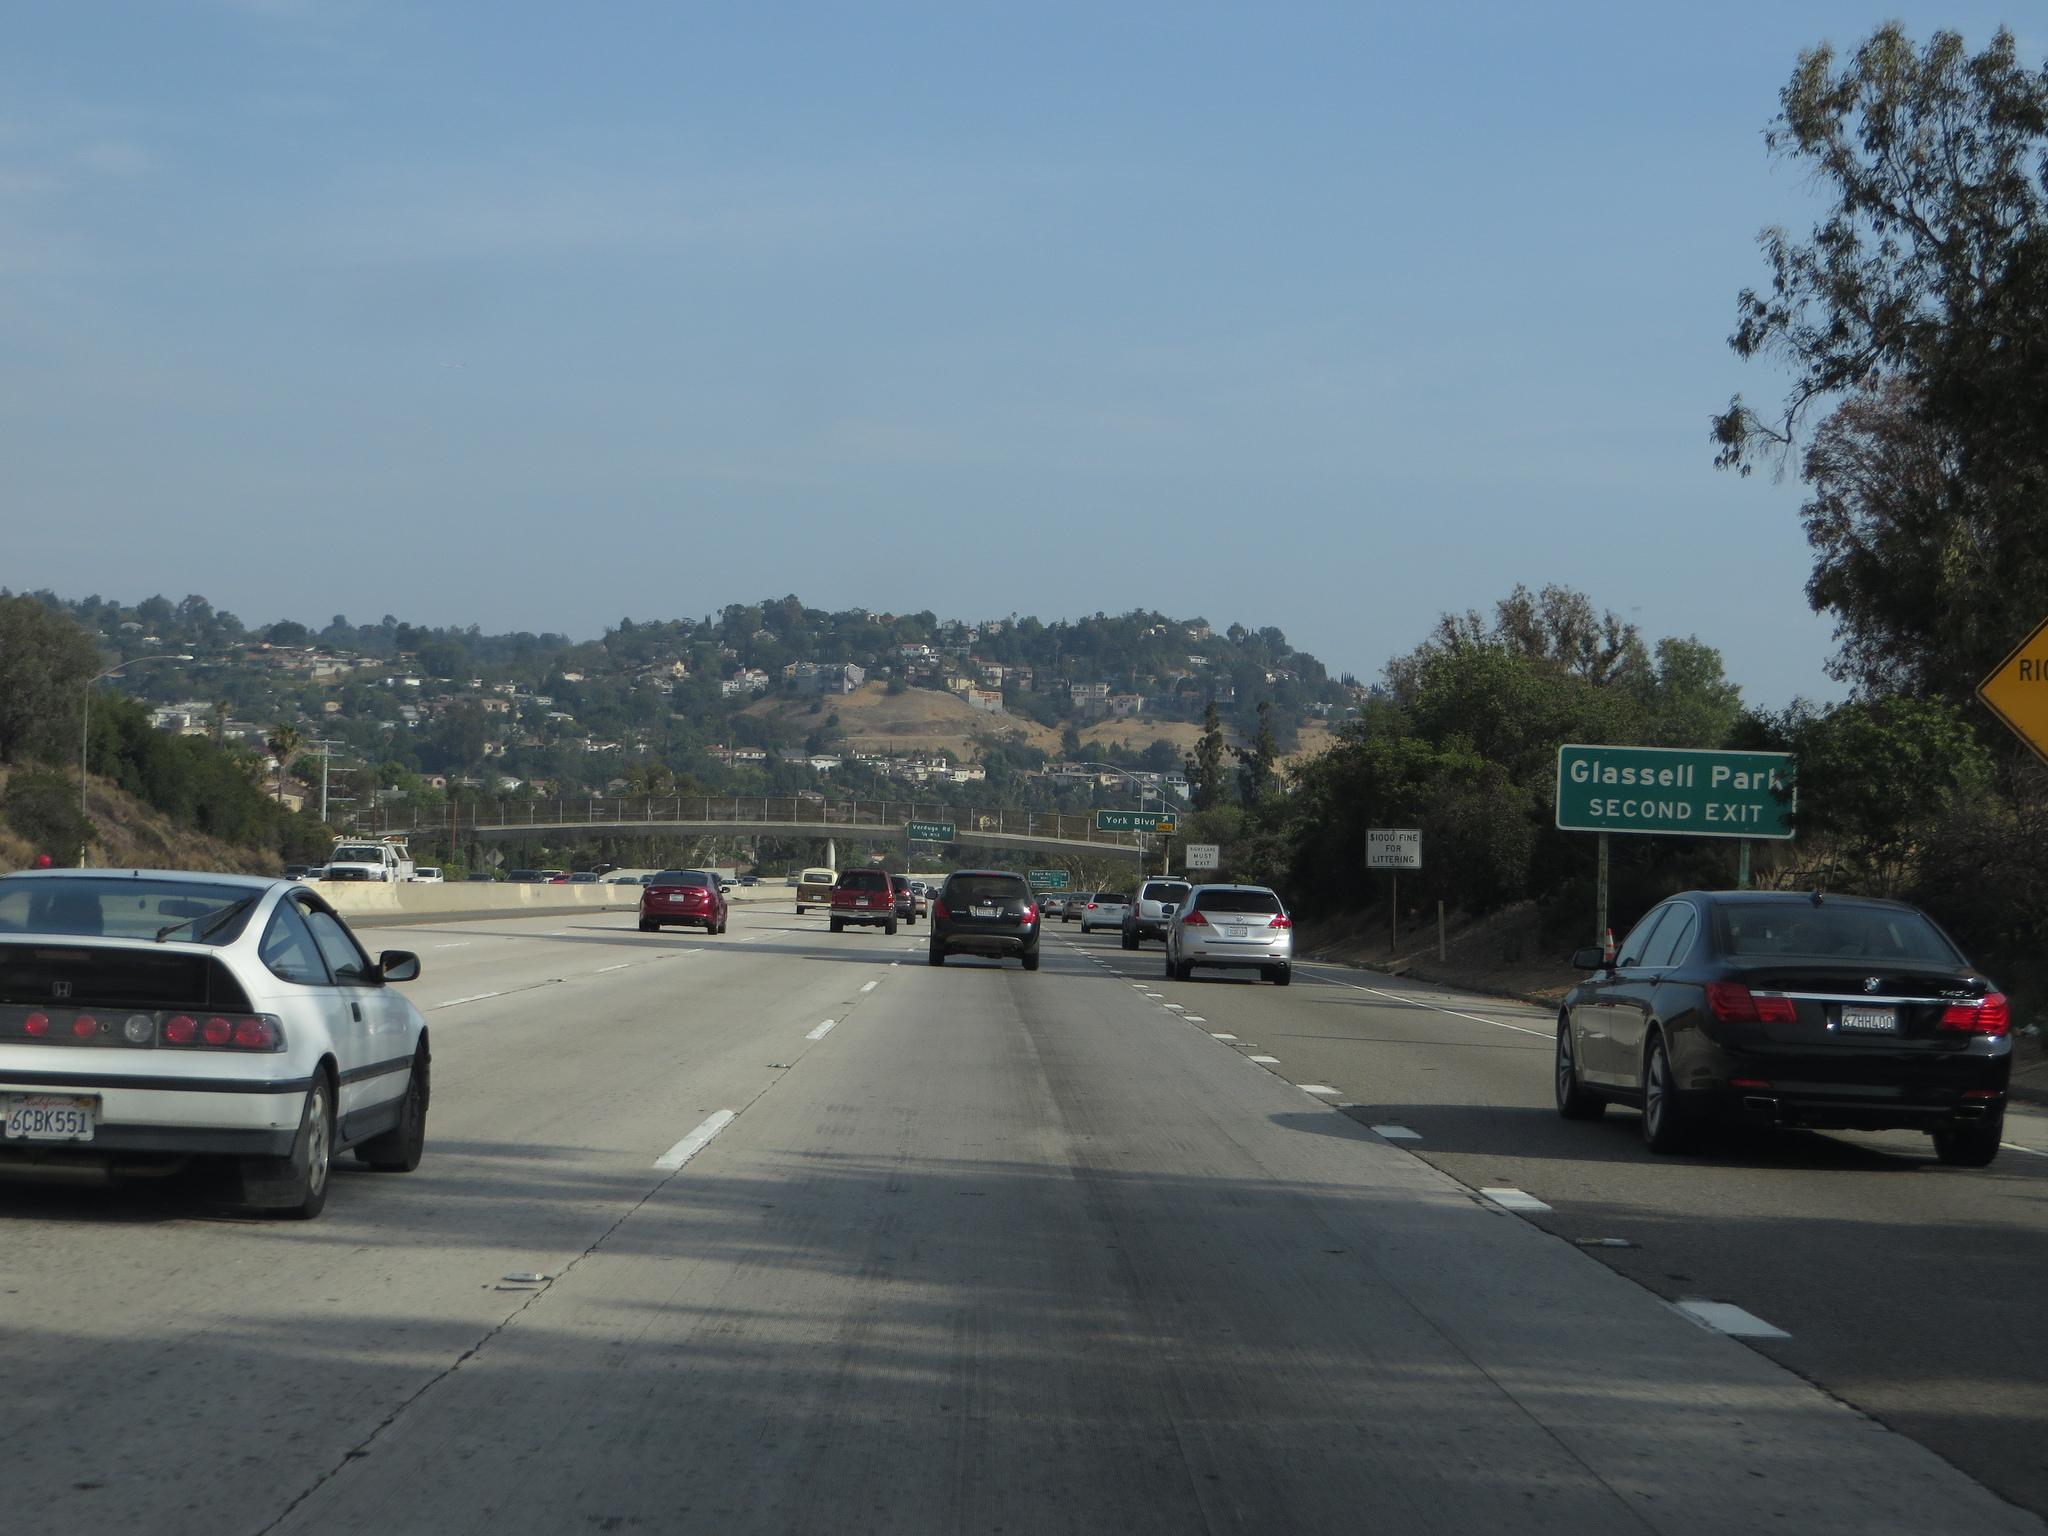 6. Glendale, CA